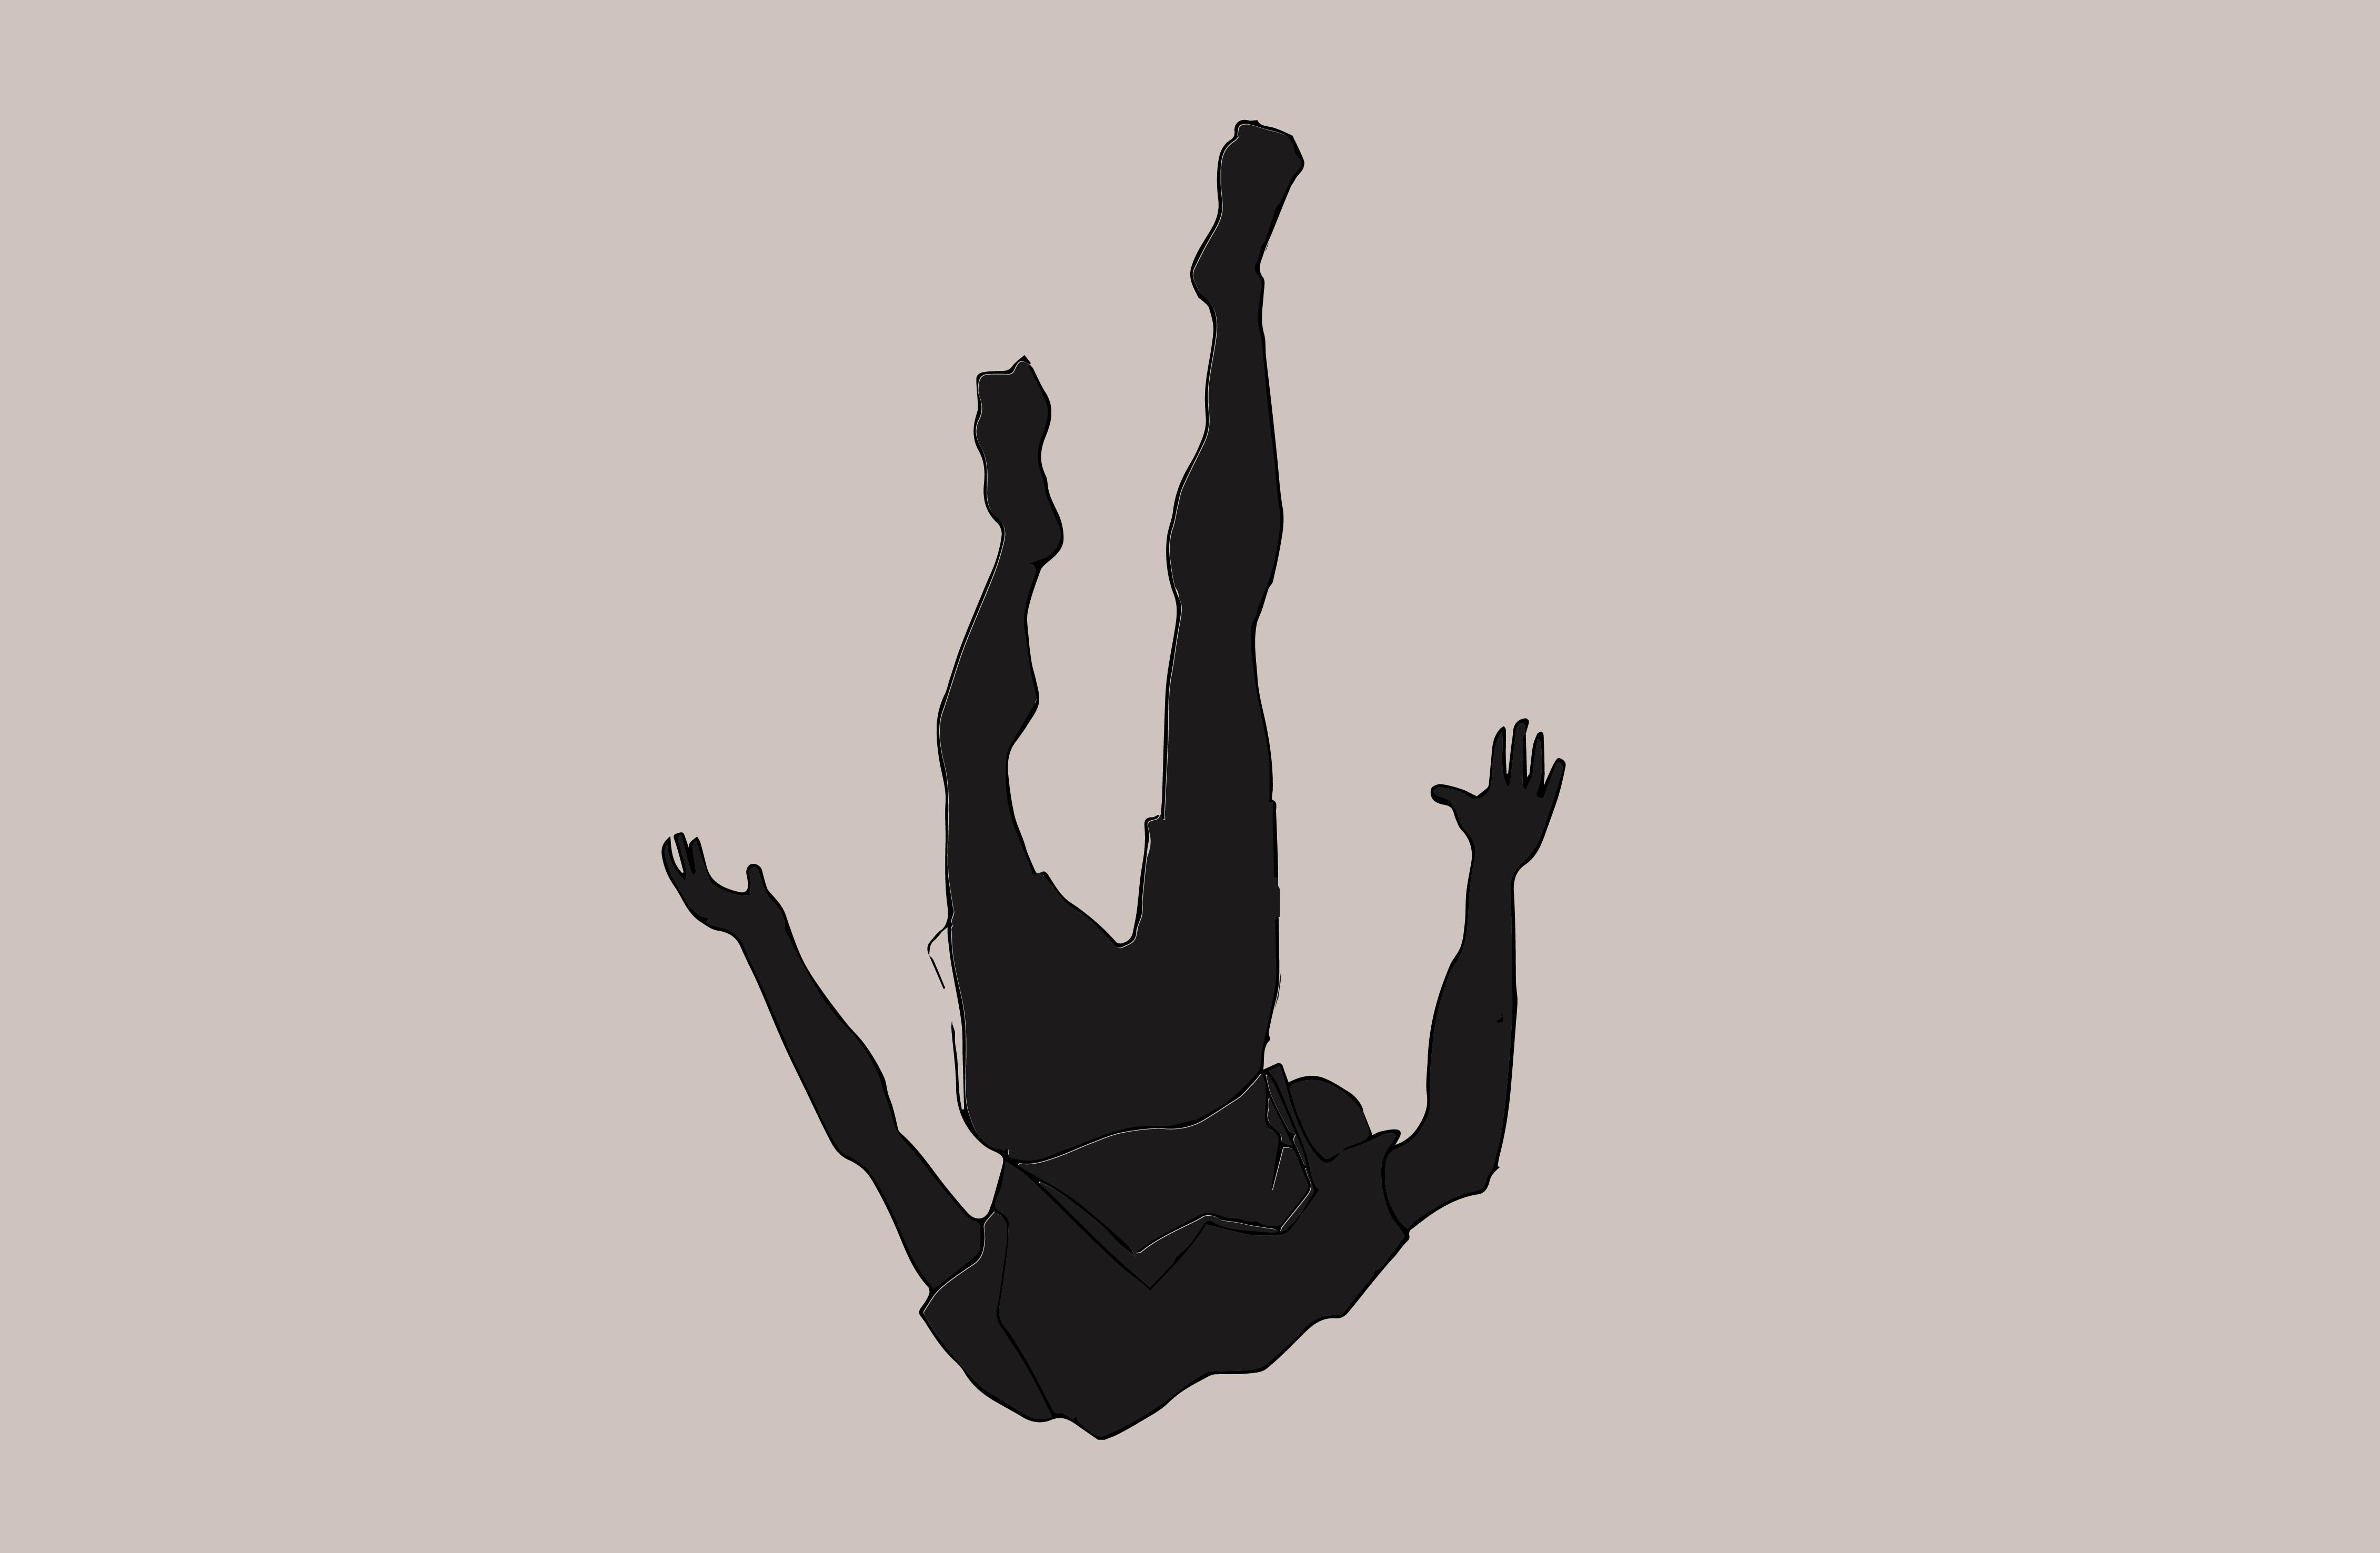 Flash Fiction: Falling